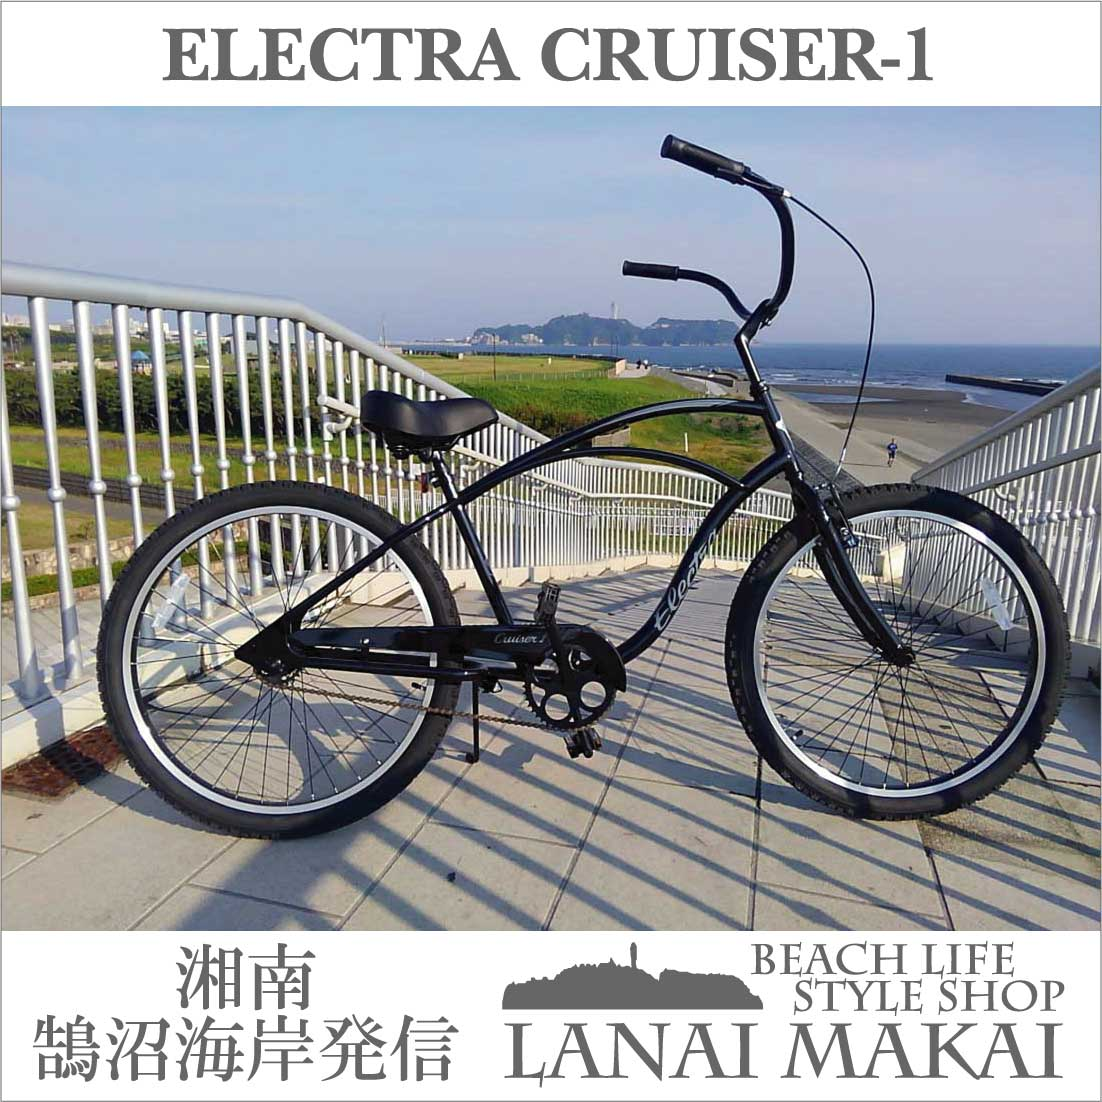 "【MODEL】エレクトラ ""ELECTRA CRUISER-1 BLK""""湘南鵠沼海岸発信""《ELECTR BEACH CRUISER ""ELECTRA CRUISER-1 BLK""》ビーチクルーザー 26インチ 自転車 メンズ レディース"